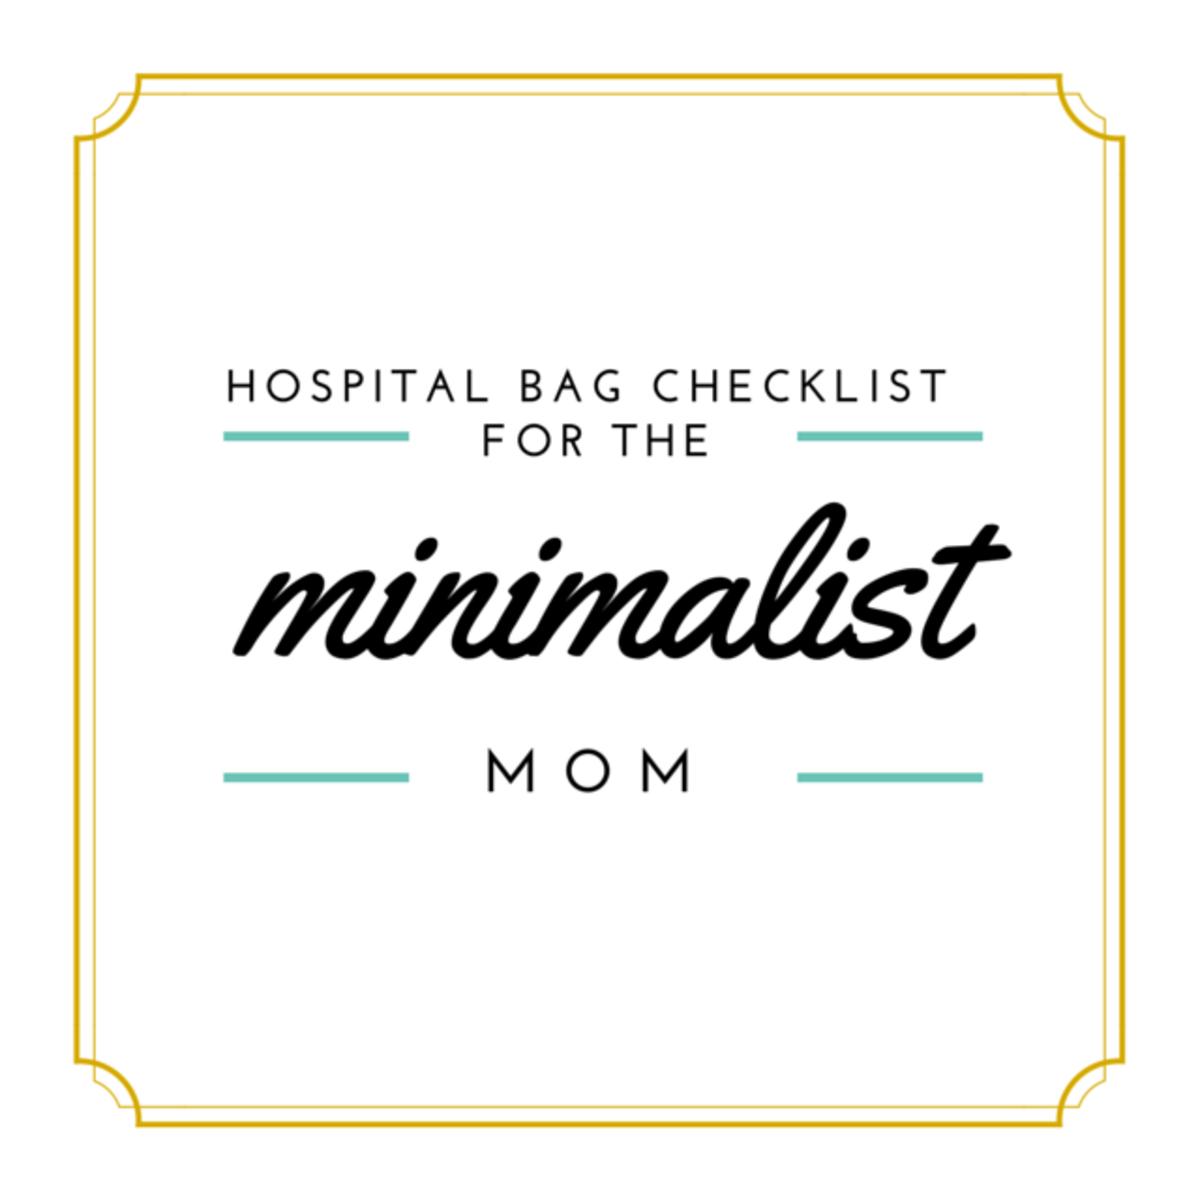 hospital-bag-checklist-for-the-minimalist-mom